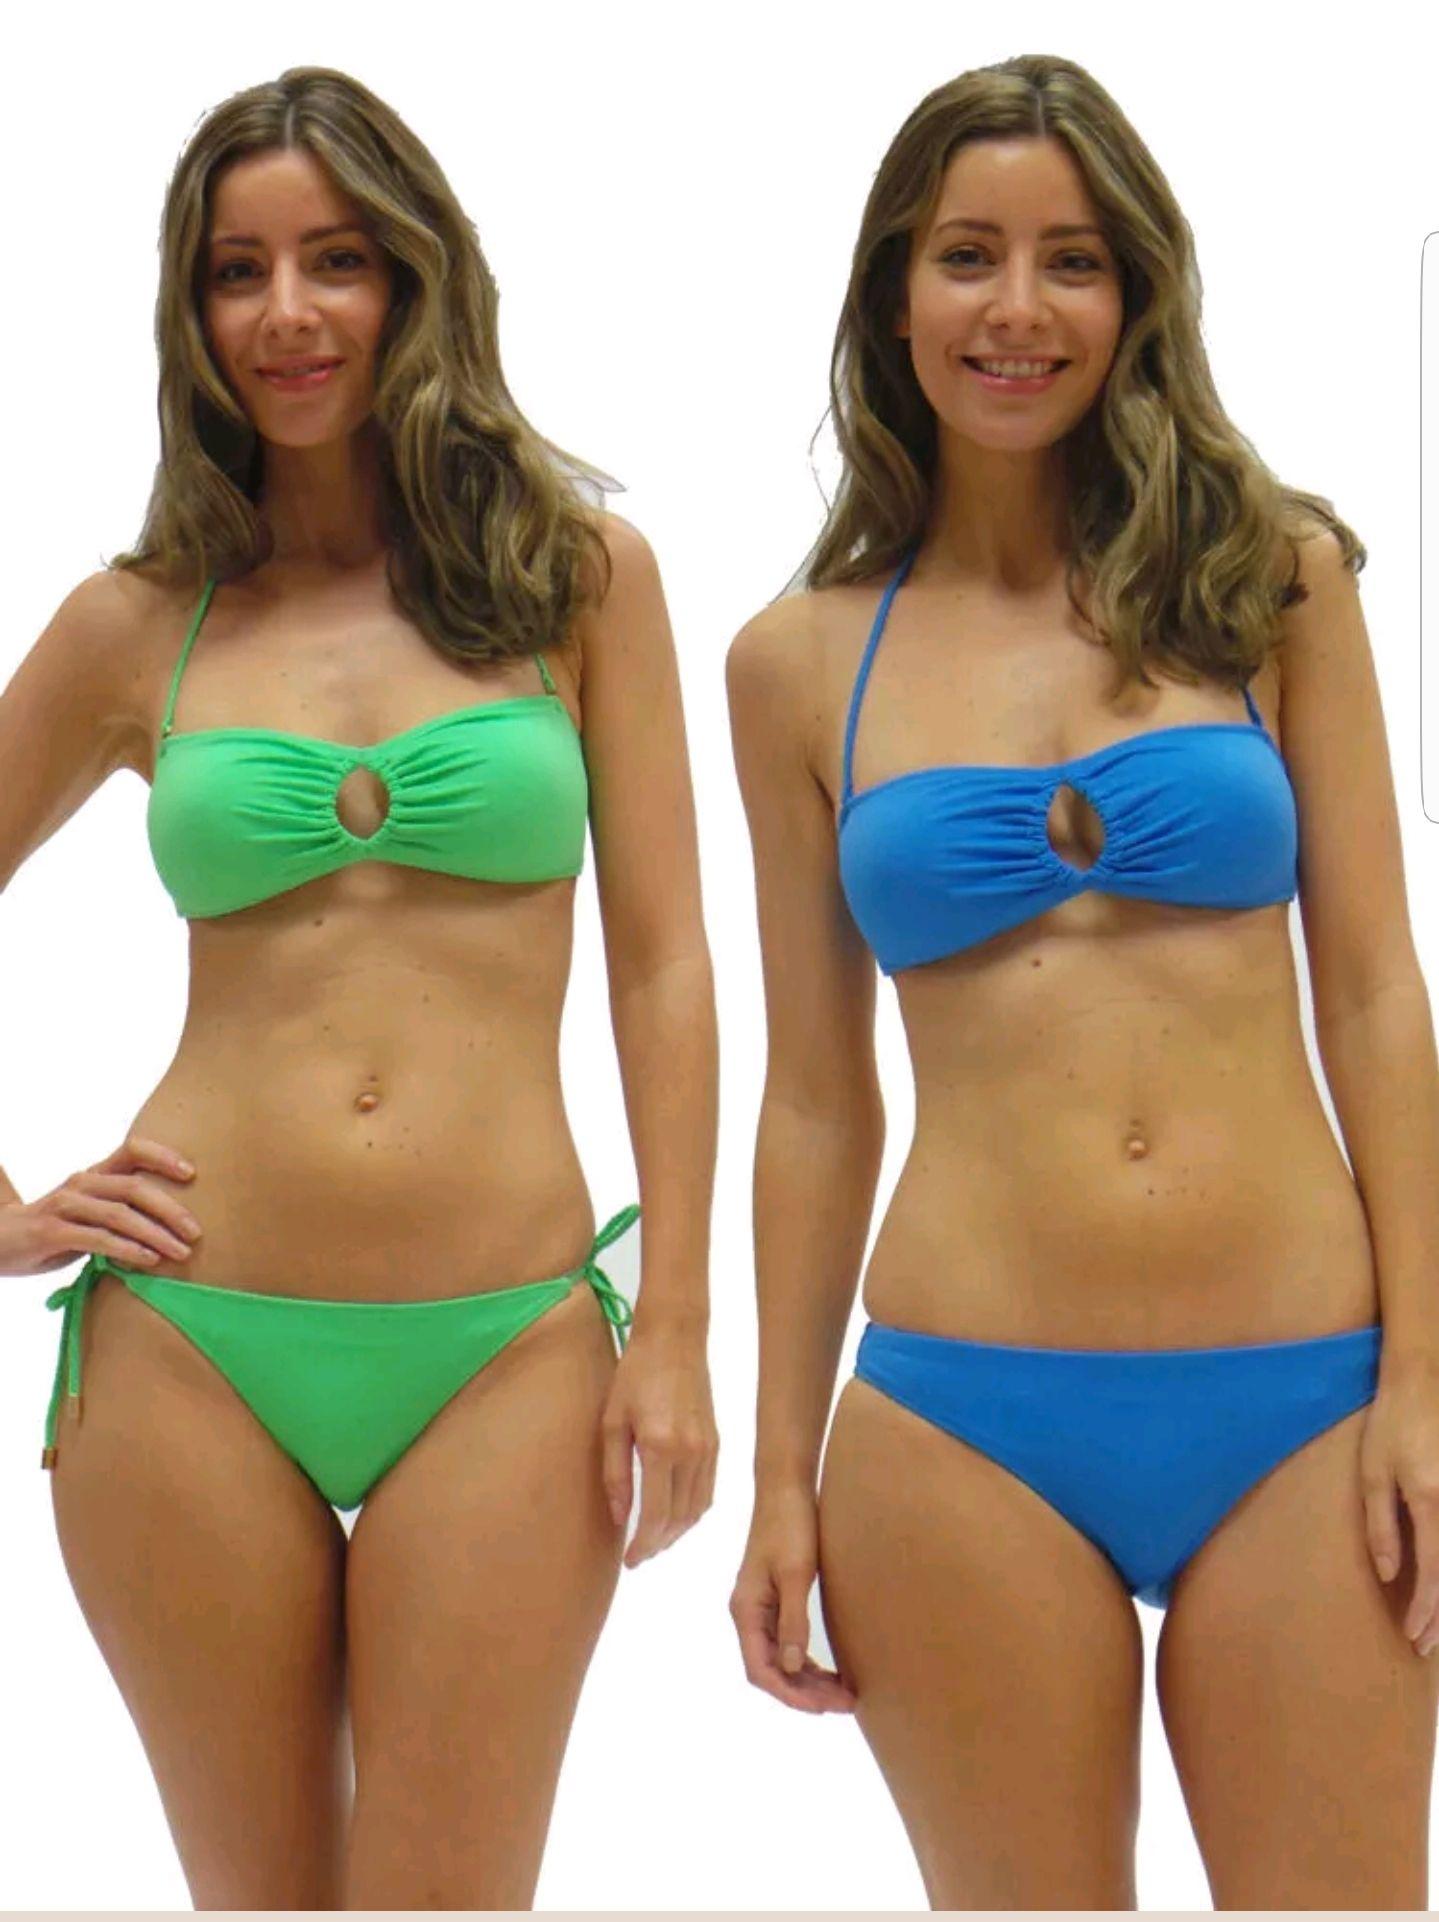 Audelle Lepel Bikini Set Soft Cup Bandeau Strapless Top Bottoms Tie Side Brief £2.99 ebay /  lingerieoutletstore